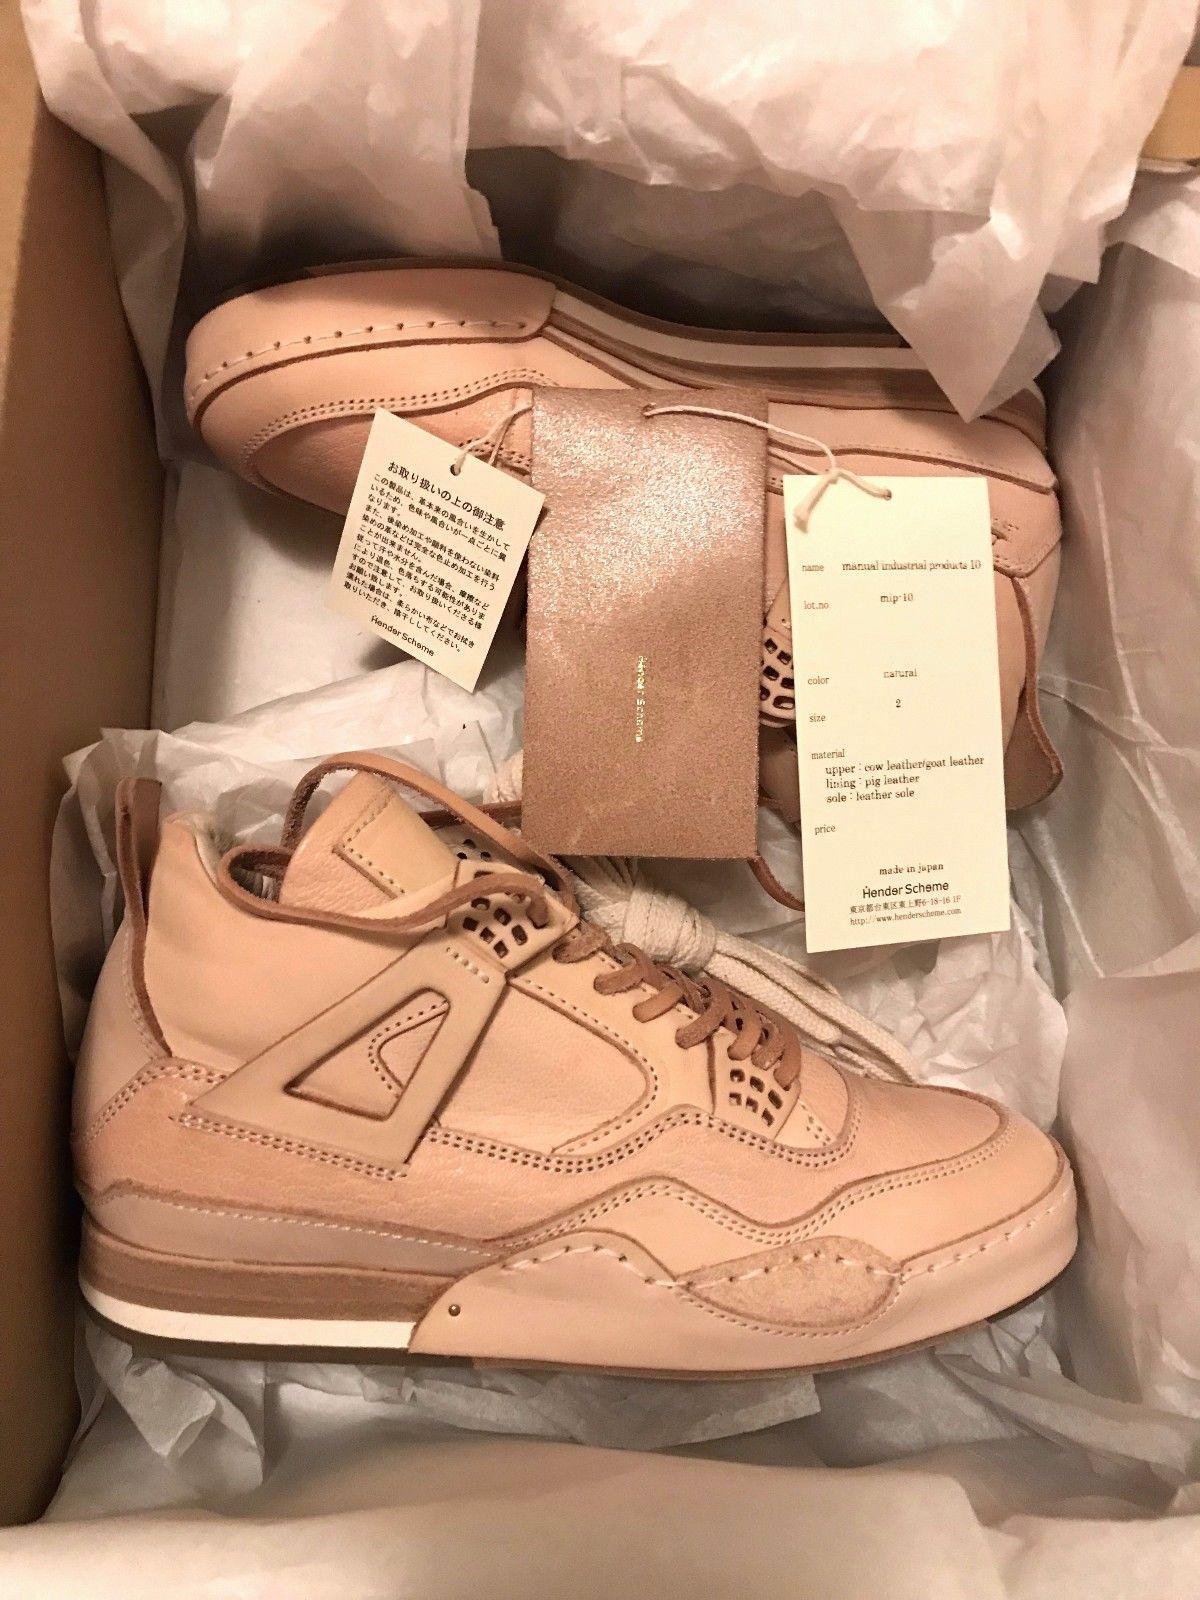 Hender Scheme MIP 10 Air Jordan 4 Brand New Size 2